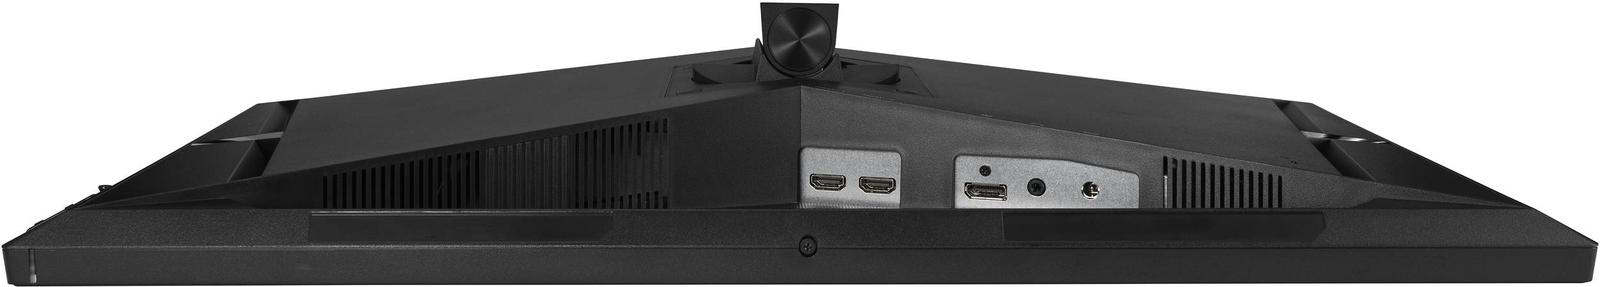 "27"" ASUS TUF Gaming 1440p 165Hz 0.4ms G-Sync HDR Monitor image"